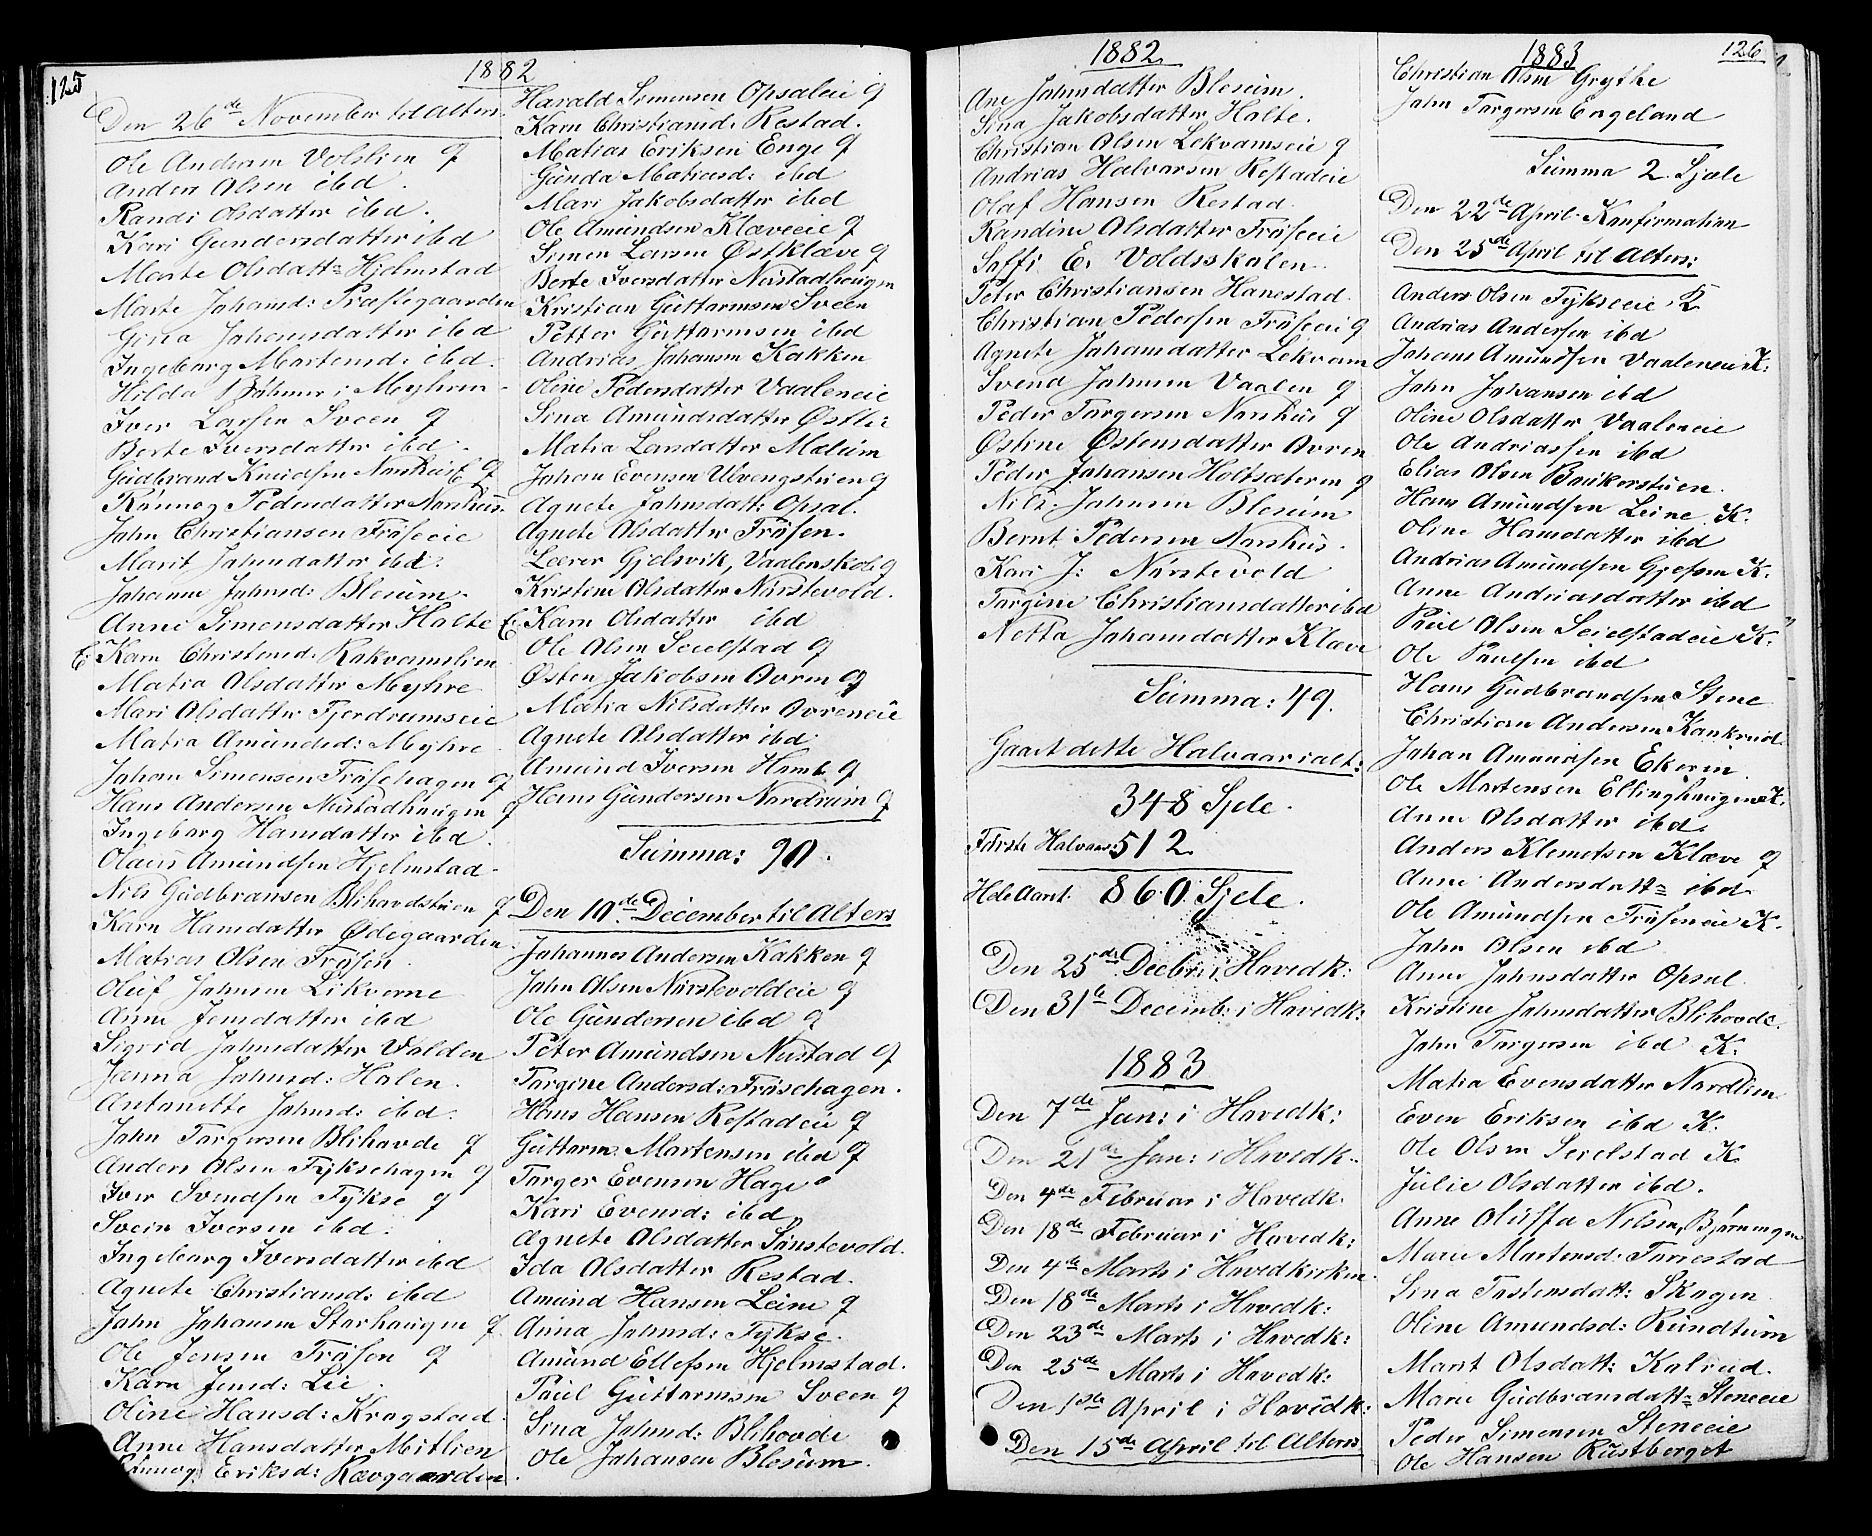 SAH, Østre Gausdal prestekontor, Klokkerbok nr. 1, 1863-1893, s. 125-126